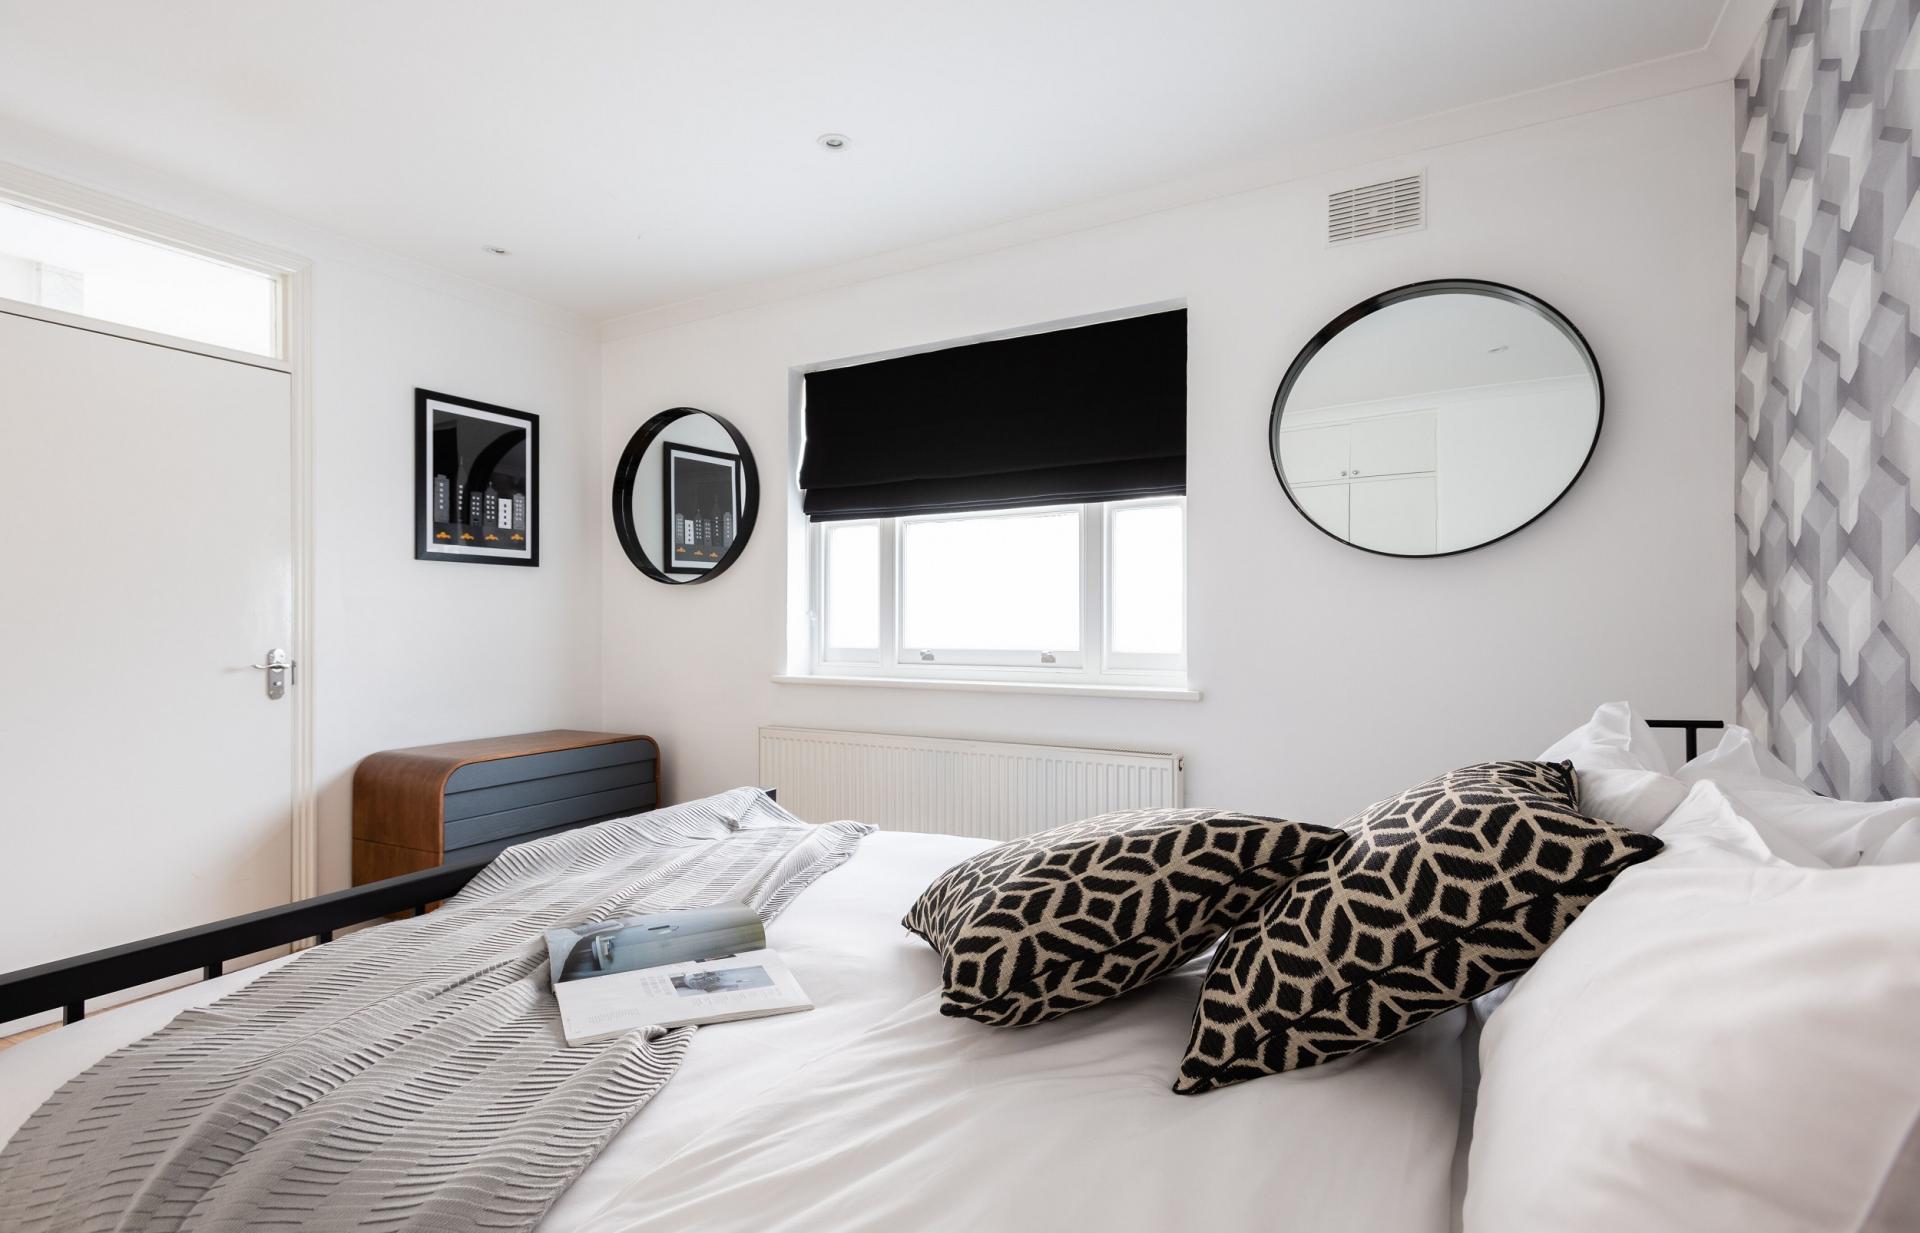 Comfy bed at The Kensington Palace Mews, Kensington, London - Citybase Apartments